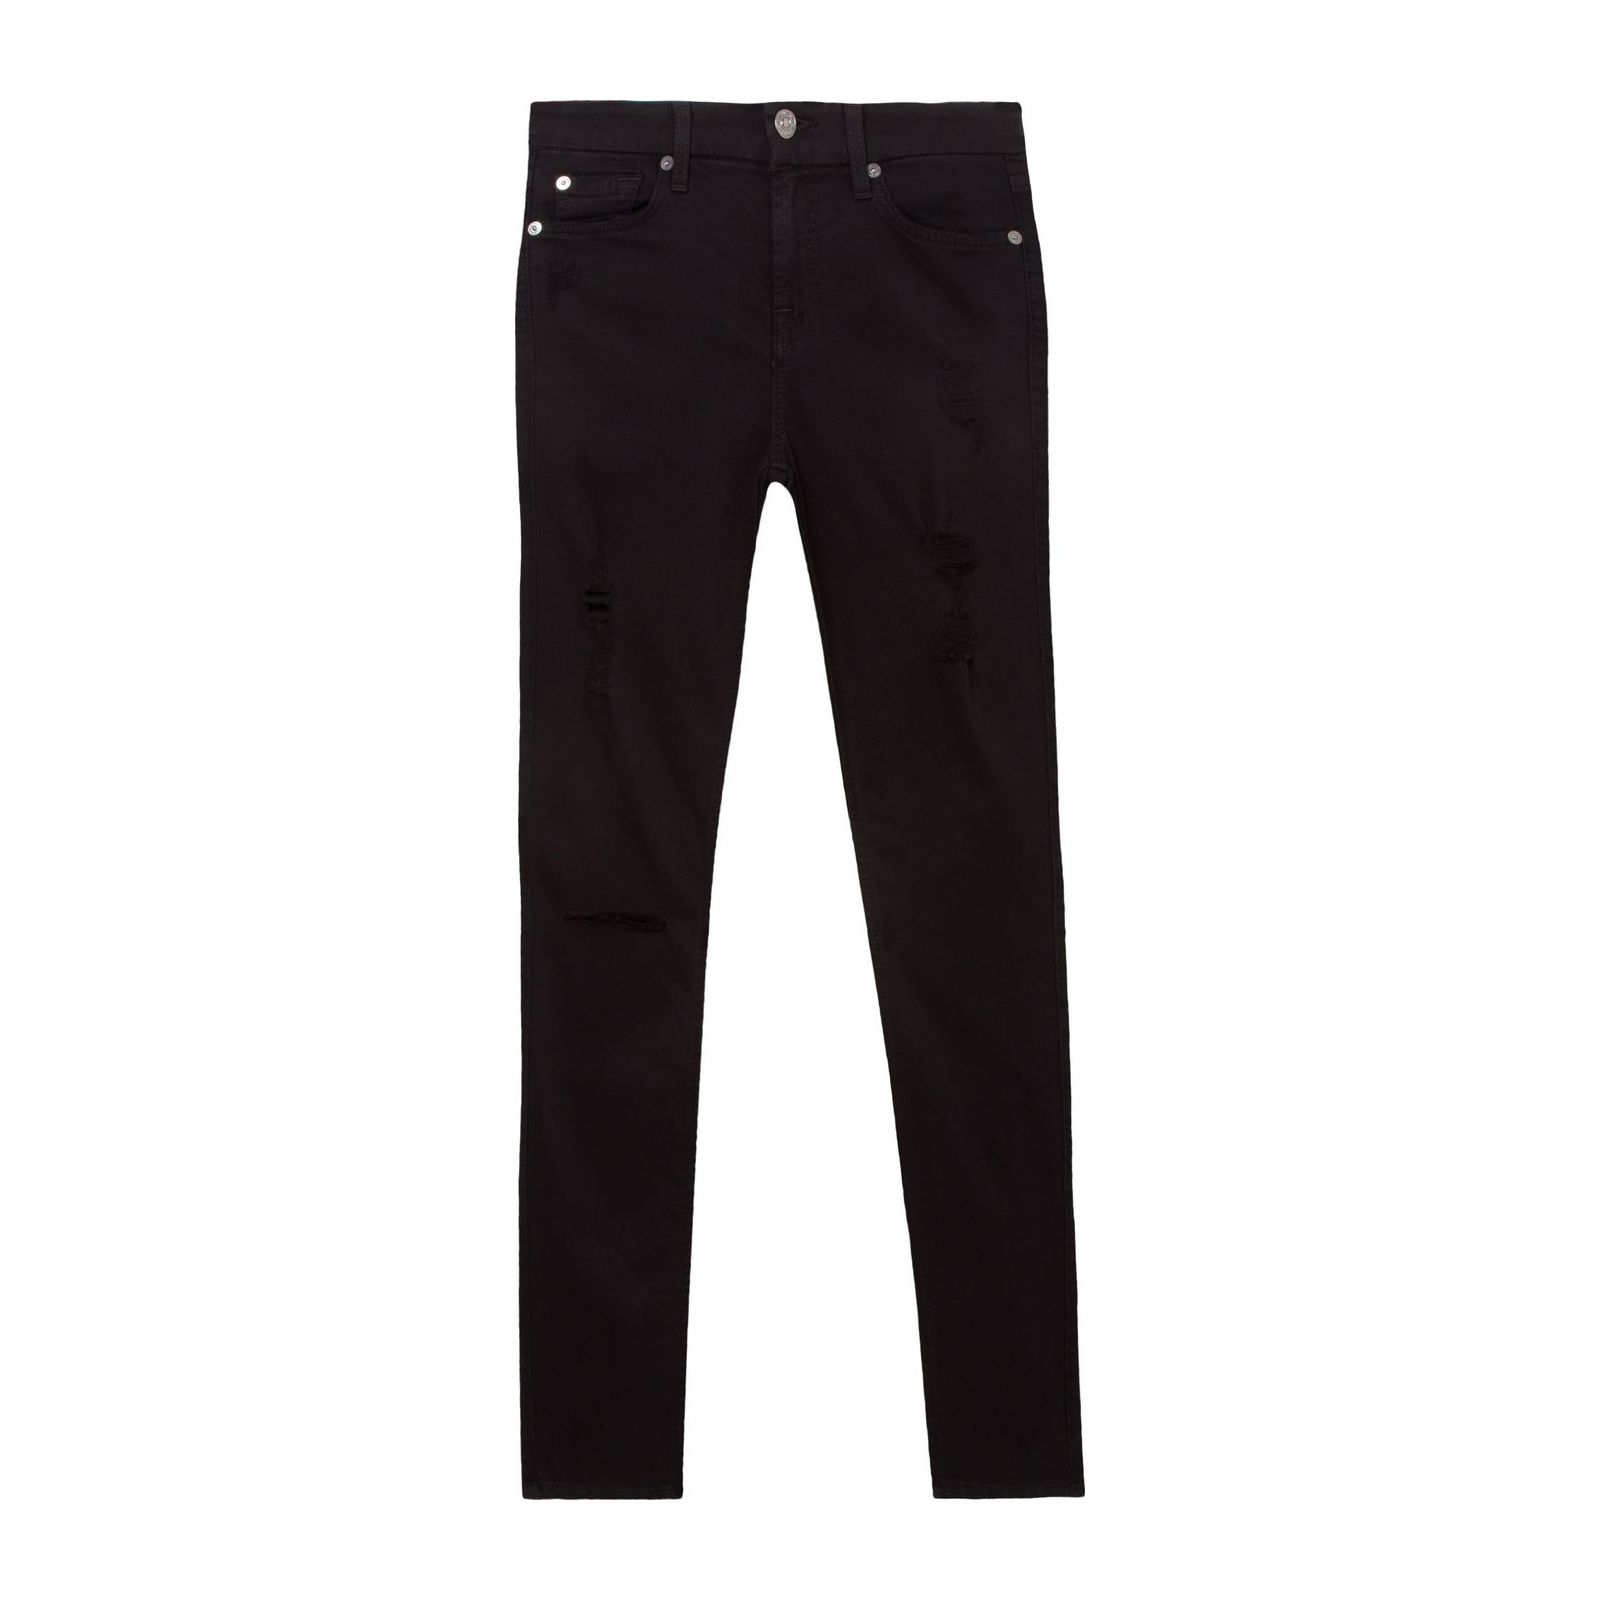 Calça Jeans The Ankle Skinny Destroyed - Preta